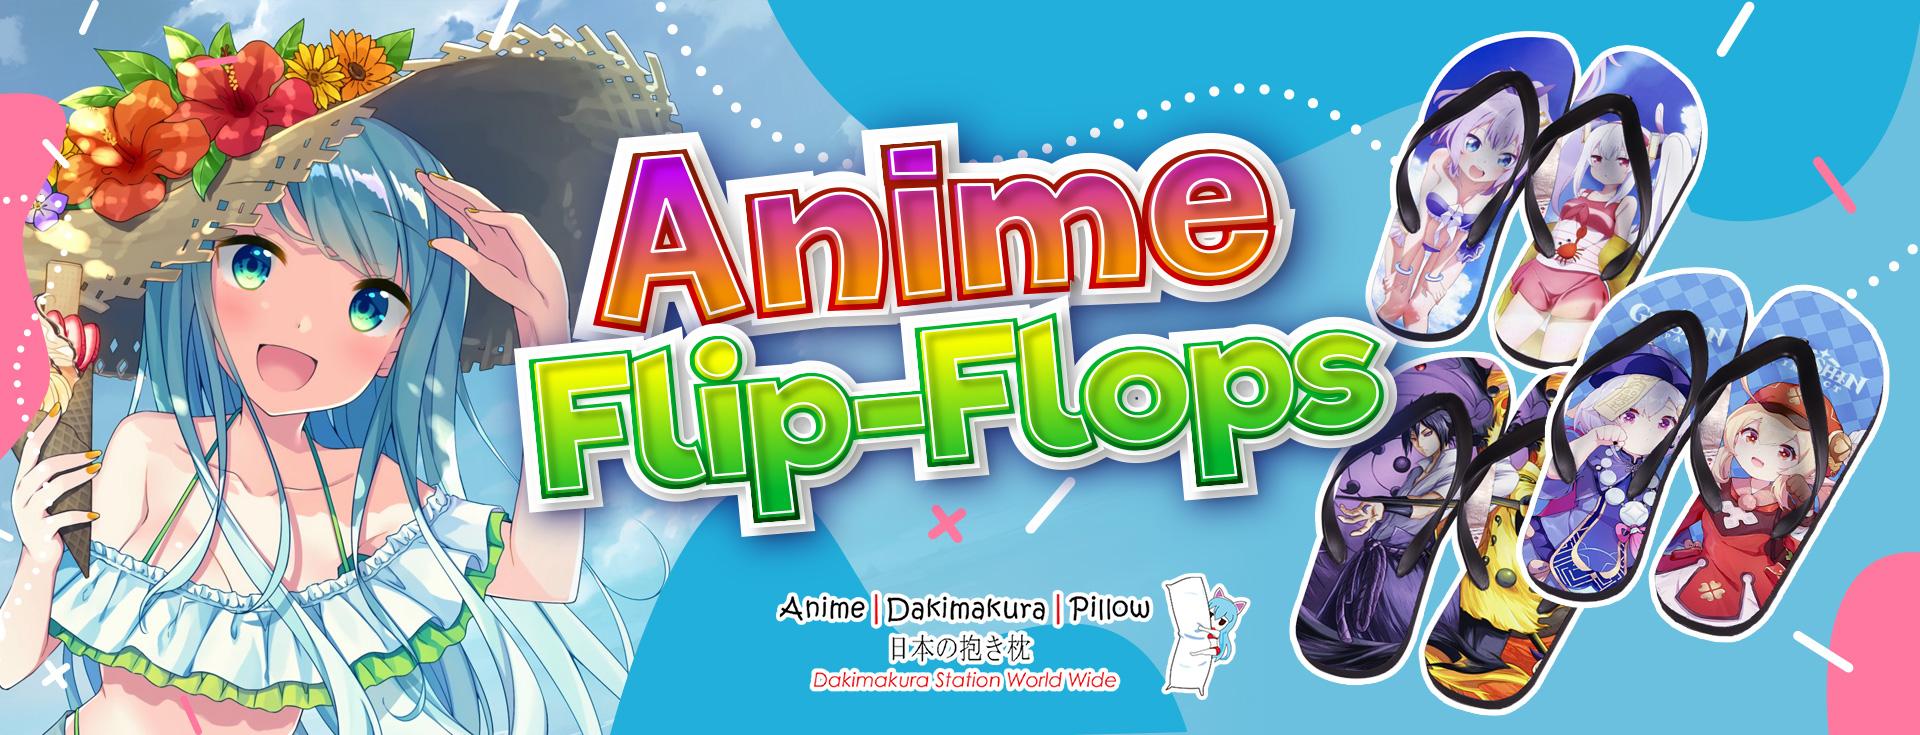 flipflop-category-image-3.jpg